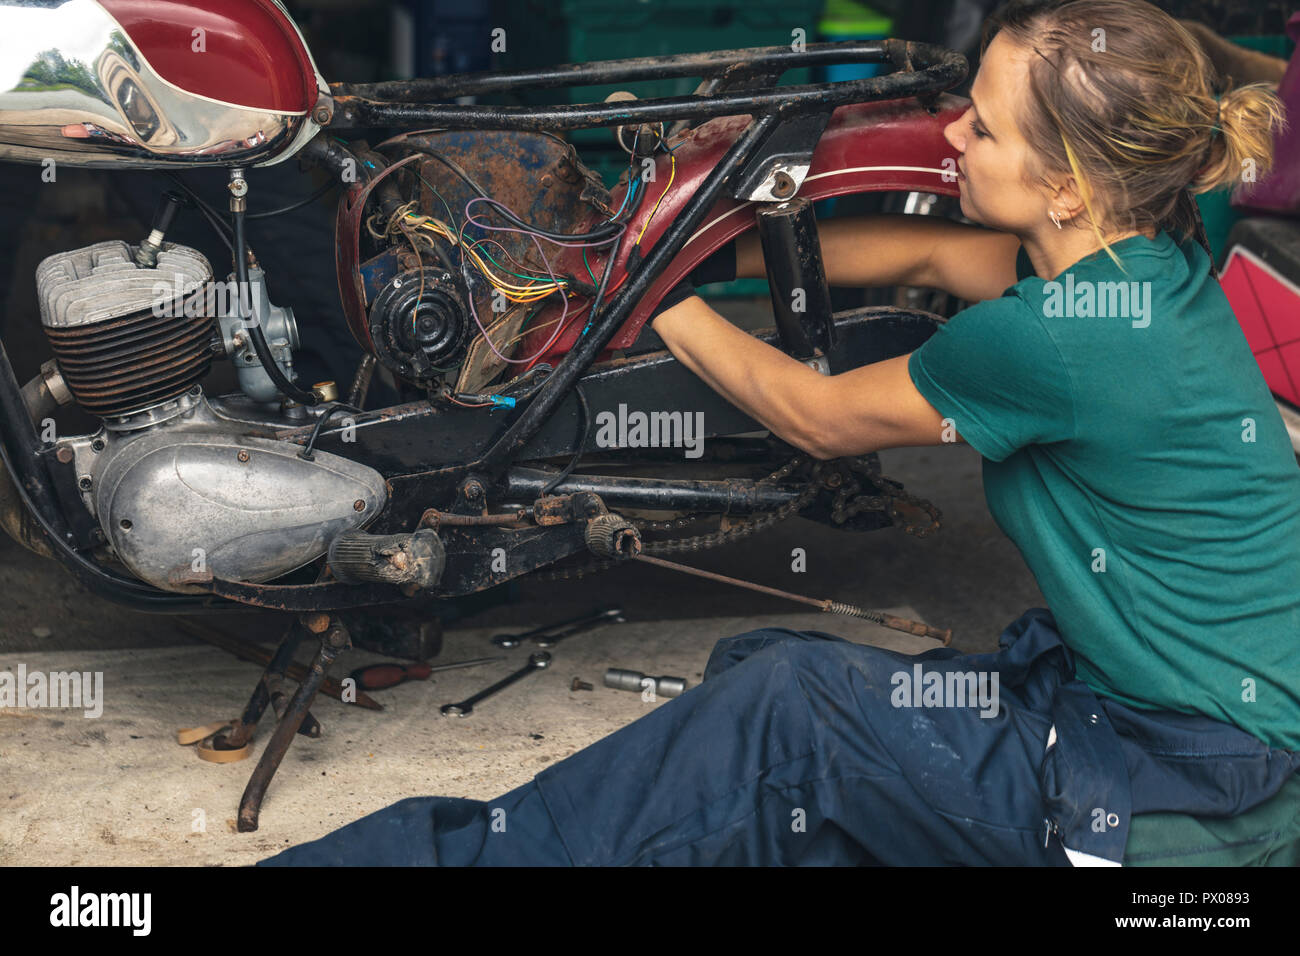 Femme mechanic repairing moto dans garage Banque D'Images